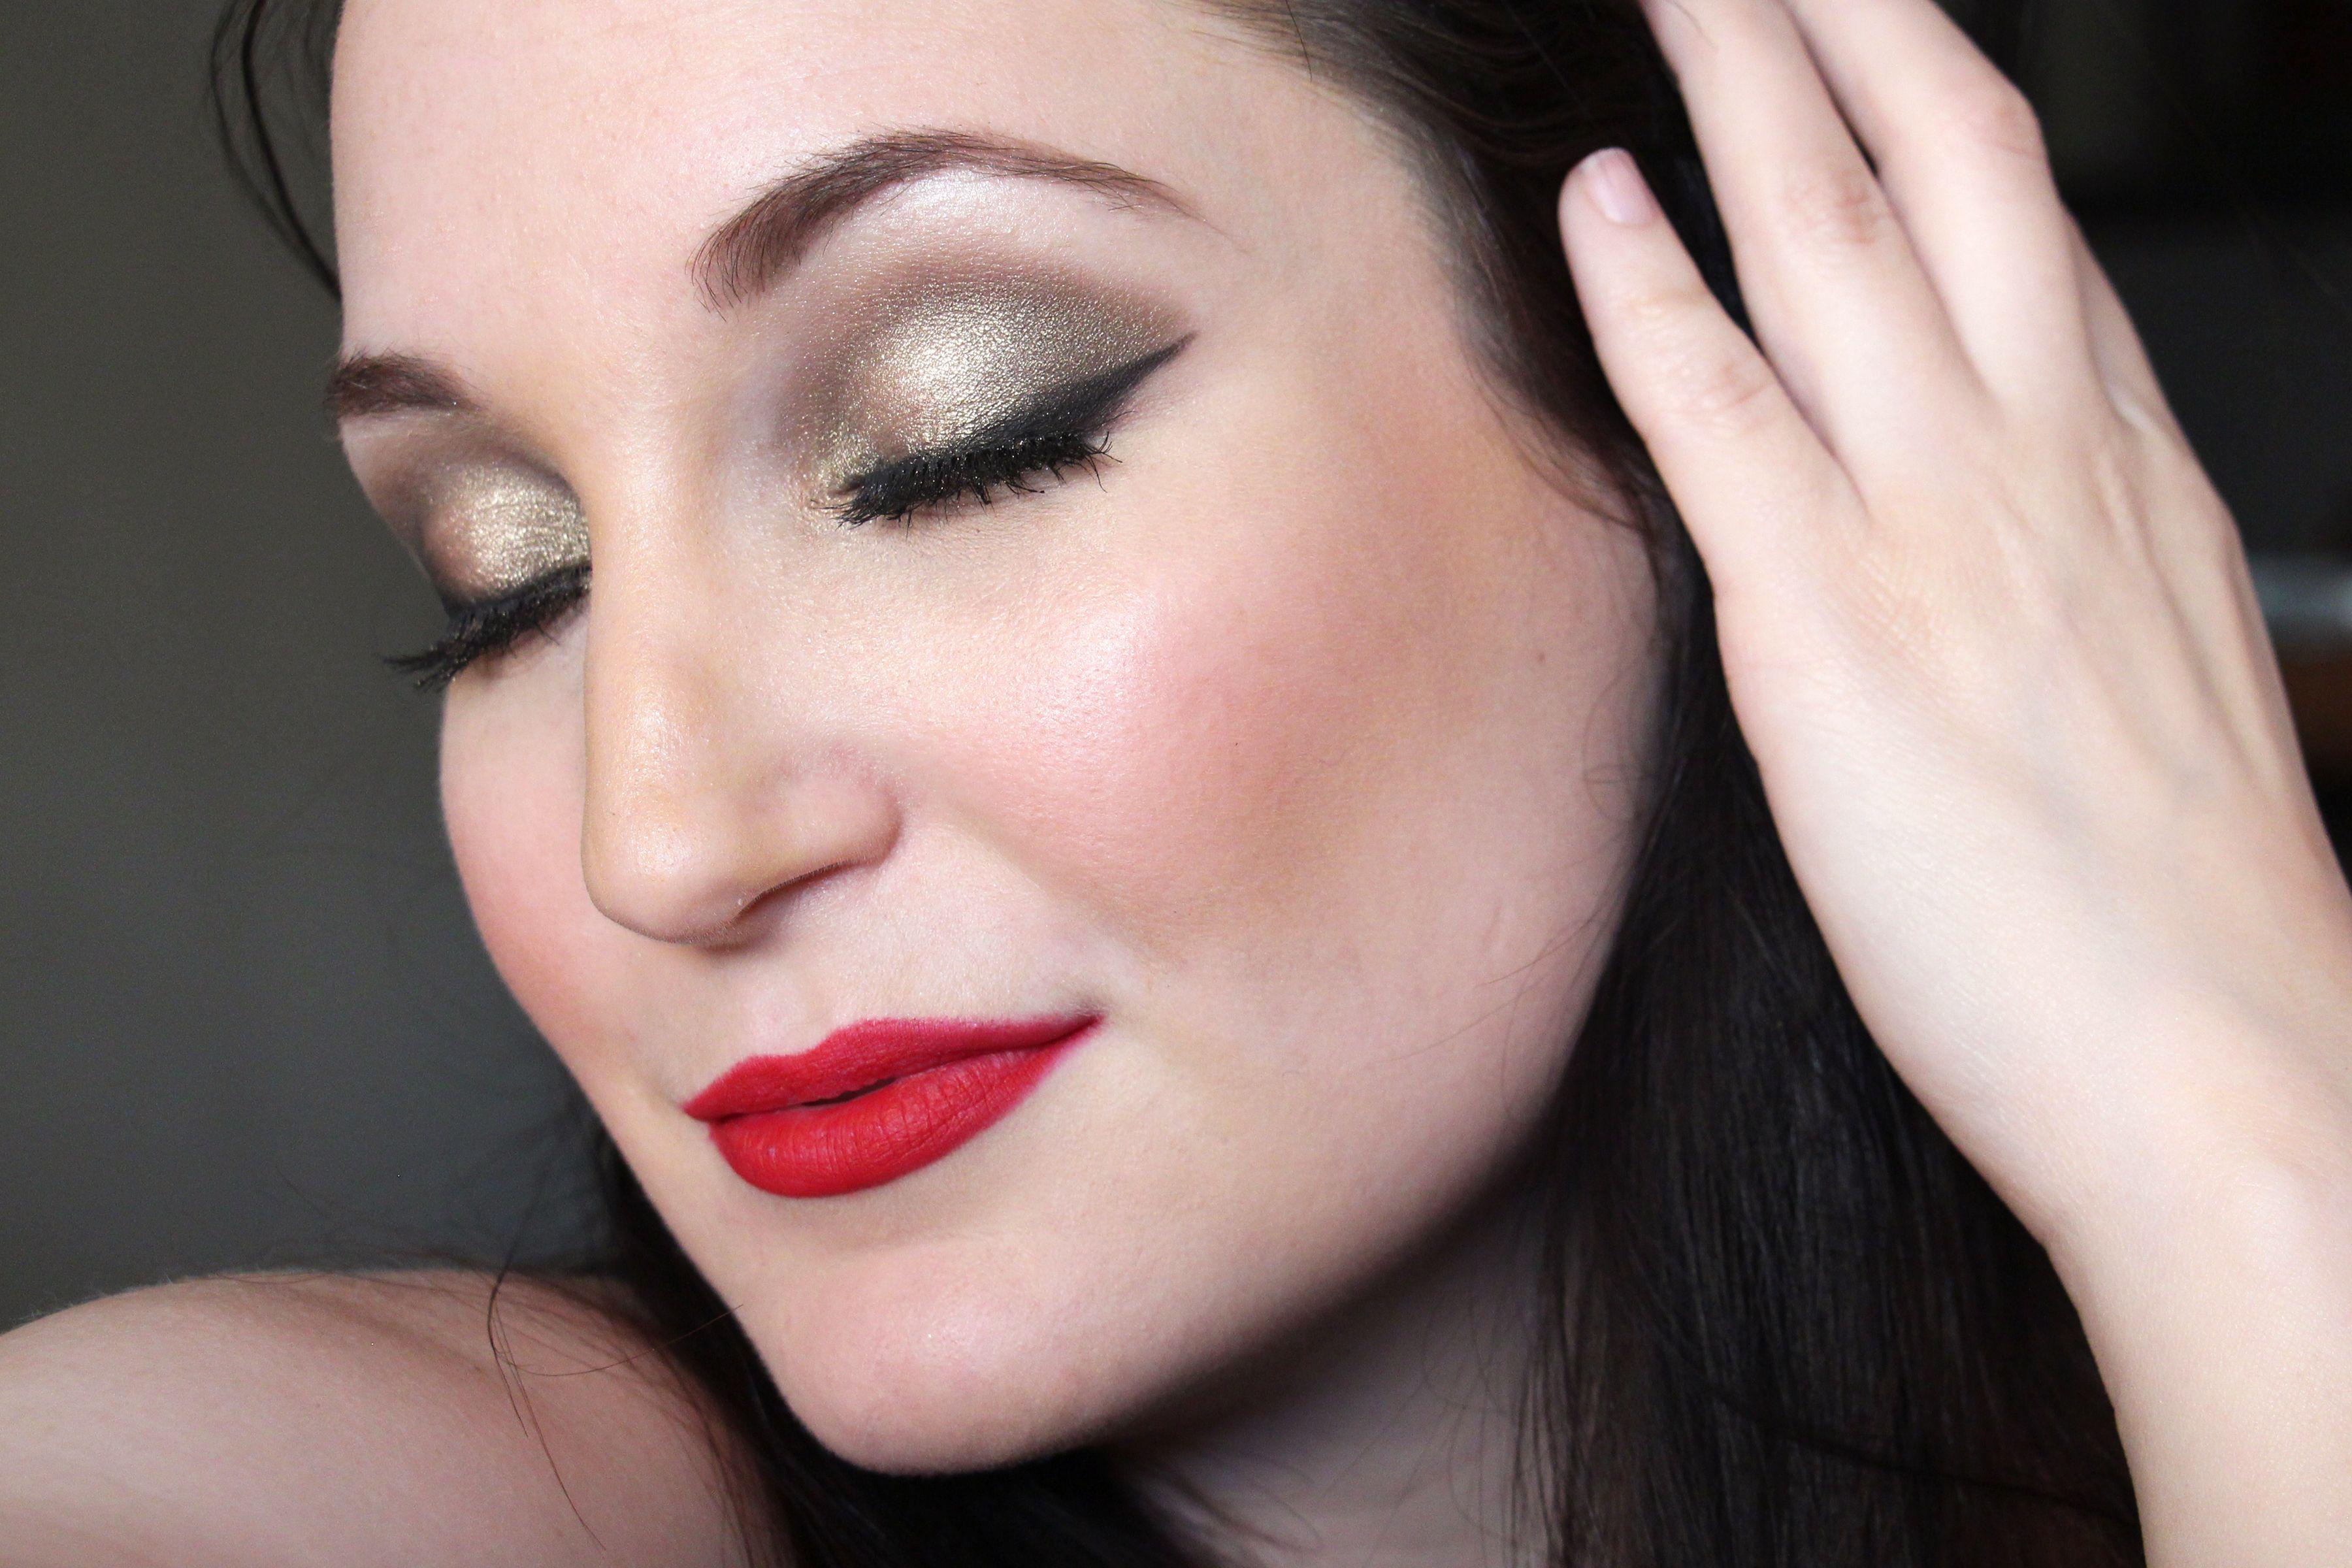 Bobbi Brown Manual de maquillaje para todos, desde principiantes a Pro Bobbi Brown 9780446581356 Libros